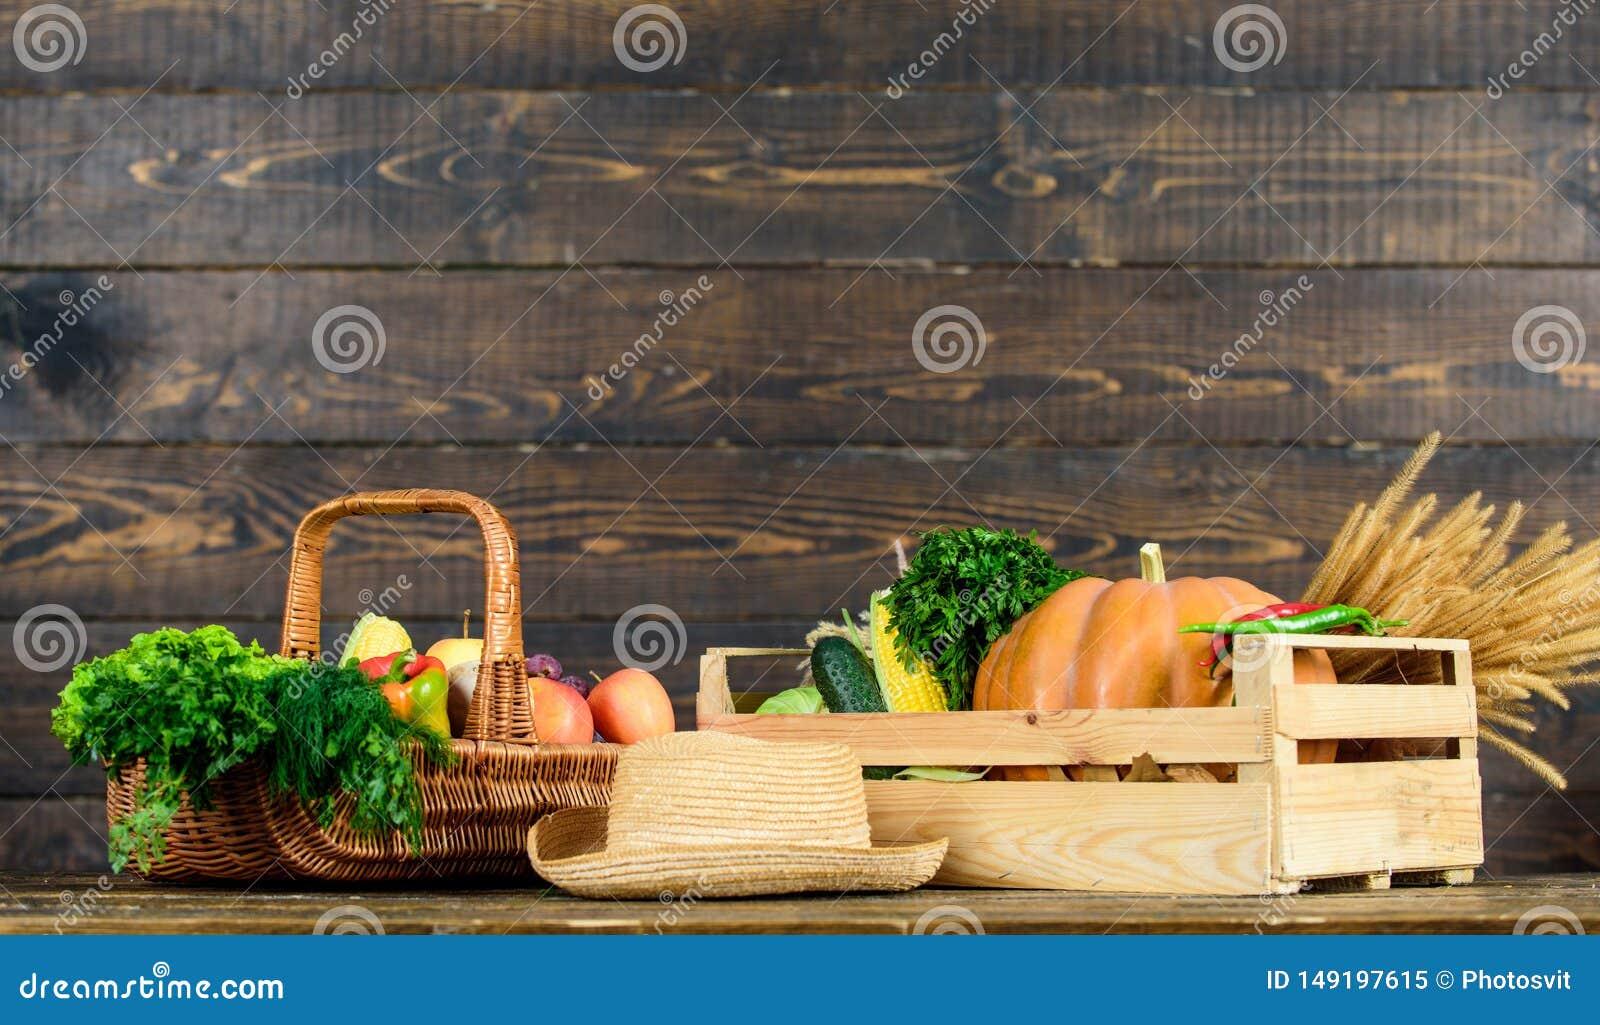 Vegetais das colheitas da colheita do outono Alimento natural cultivado localmente Mercado dos fazendeiros Vegetais vibrantes e c